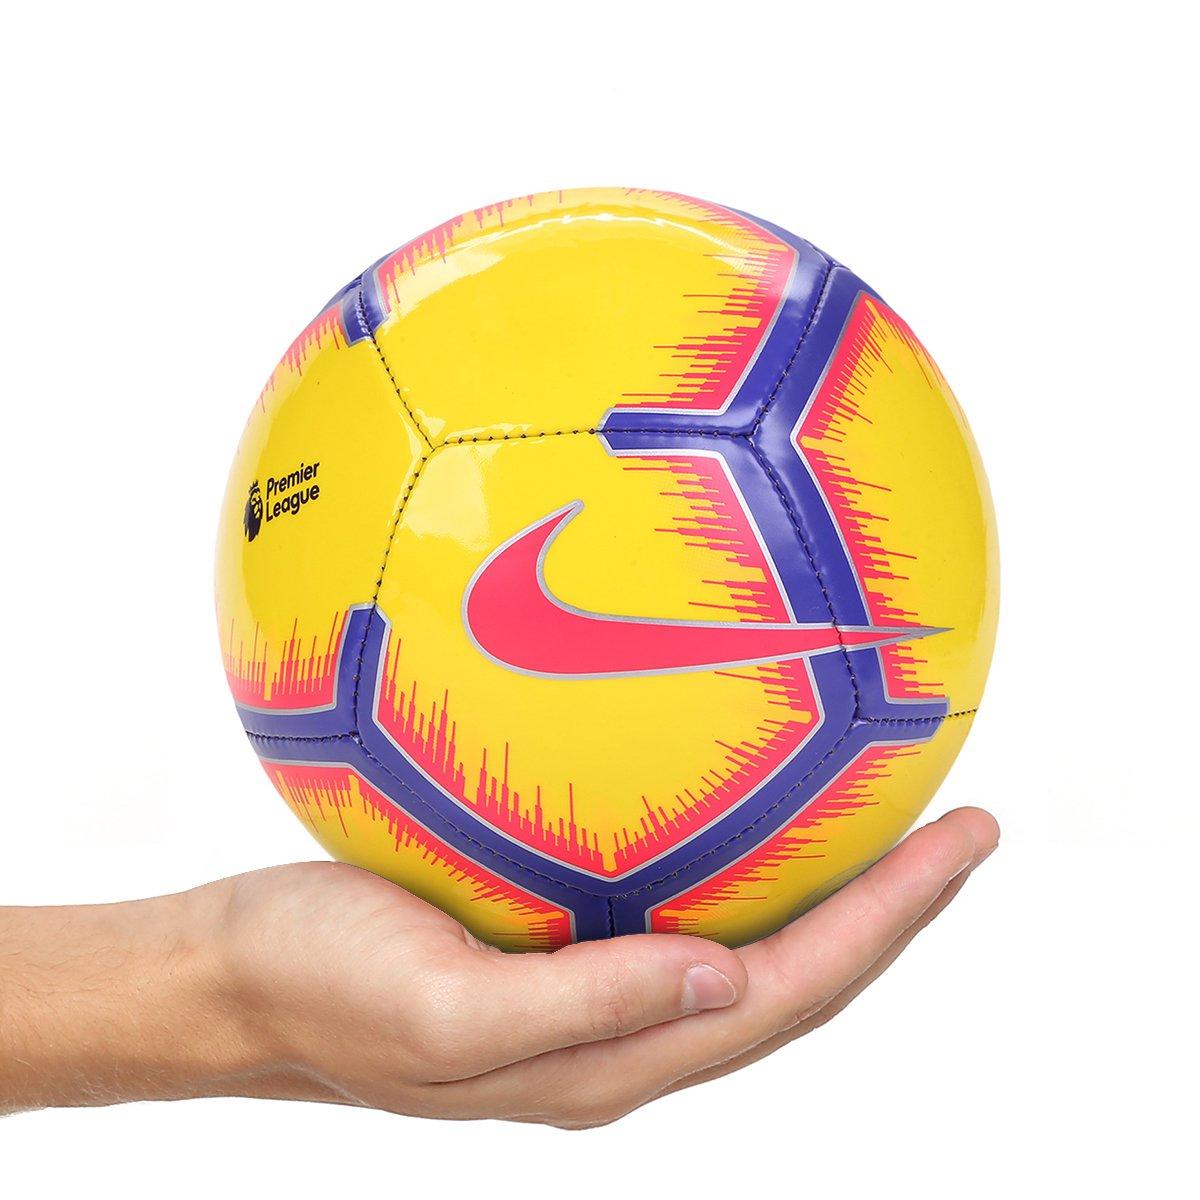 Mini Bola de Futebol Premier League 2018 Nike - Amarelo - Compre ... 295b36797f0f1